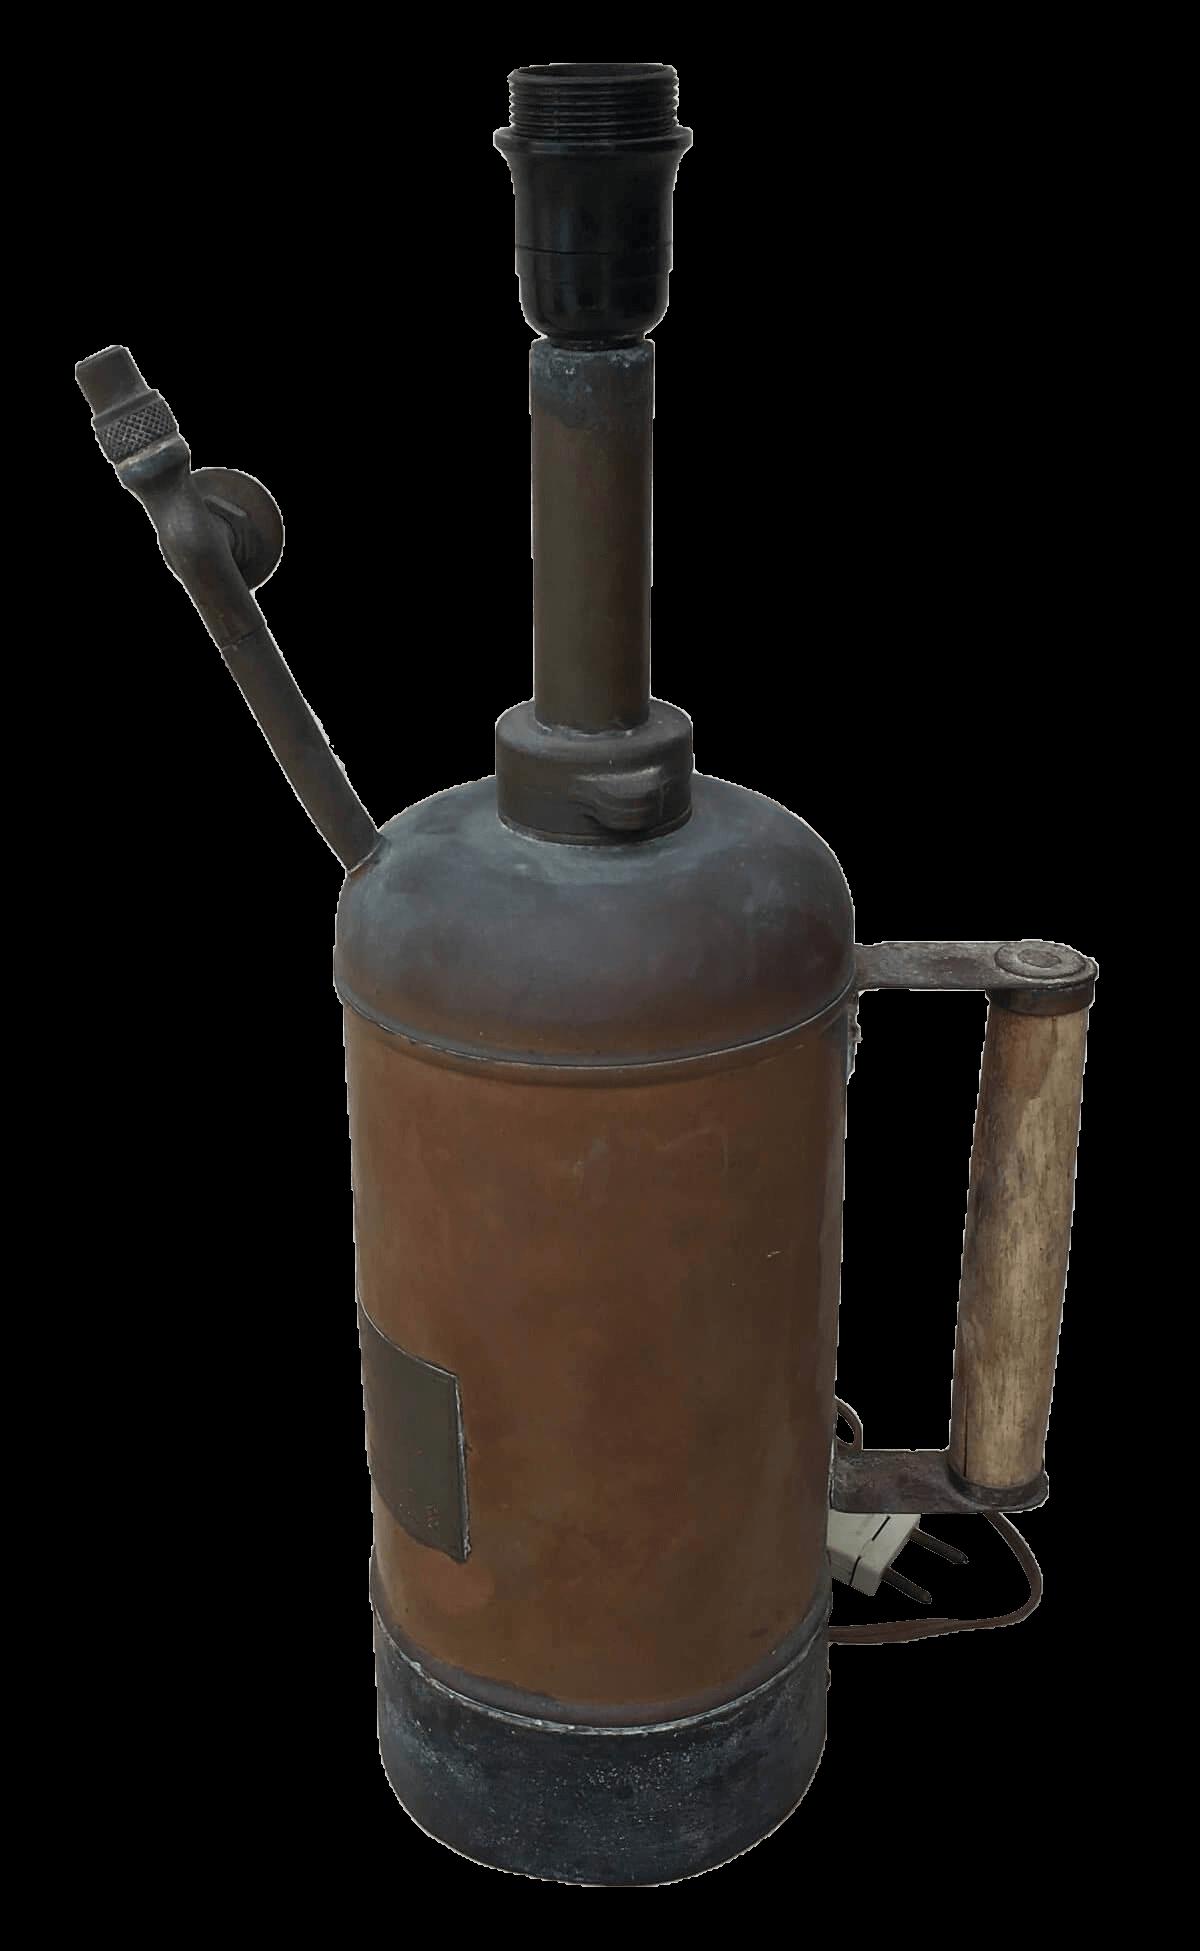 Antigo Pulverizador De Cobre Excelsior Adaptado Abajur